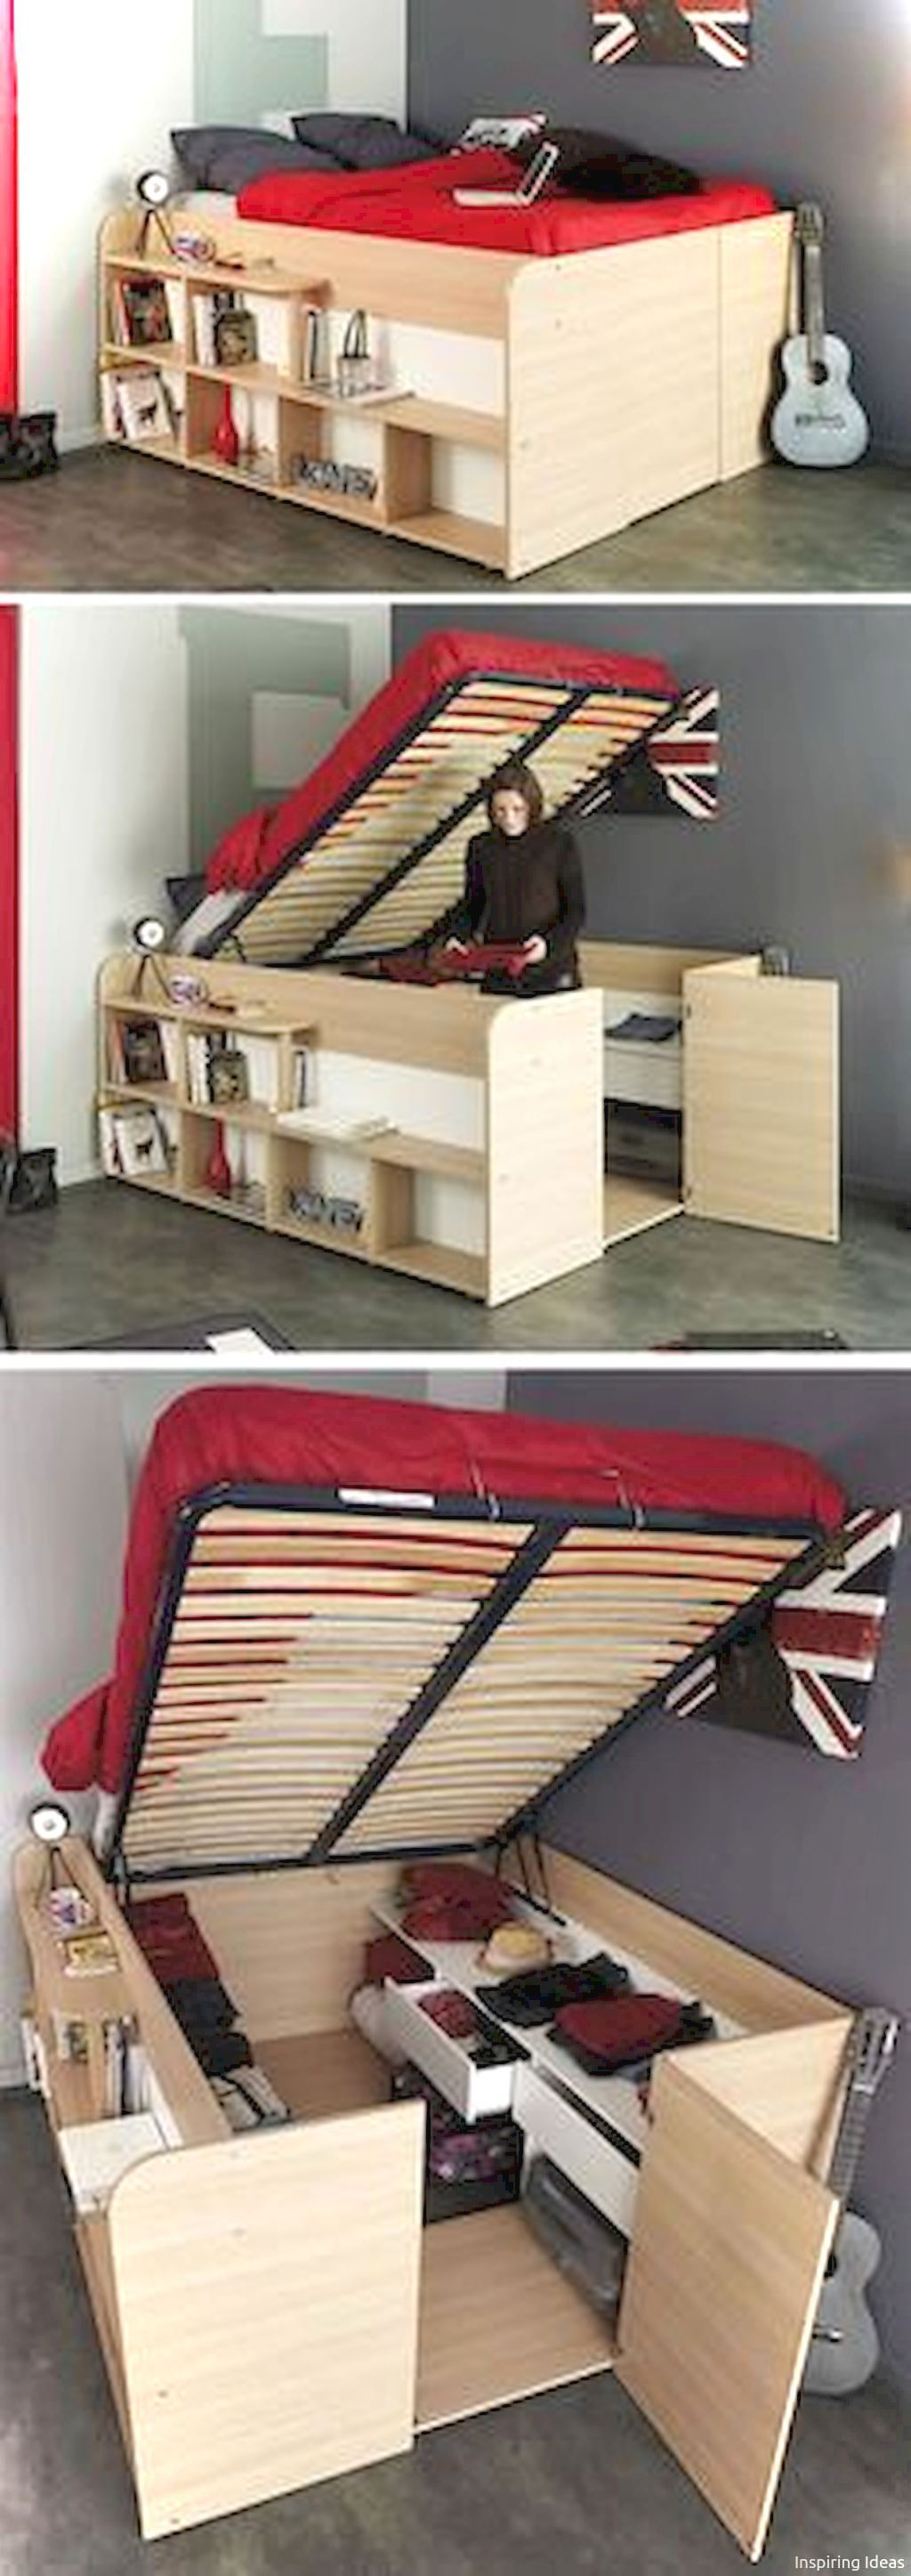 Incredible Tiny House Interior Design Ideas19 ξενοδοχειο